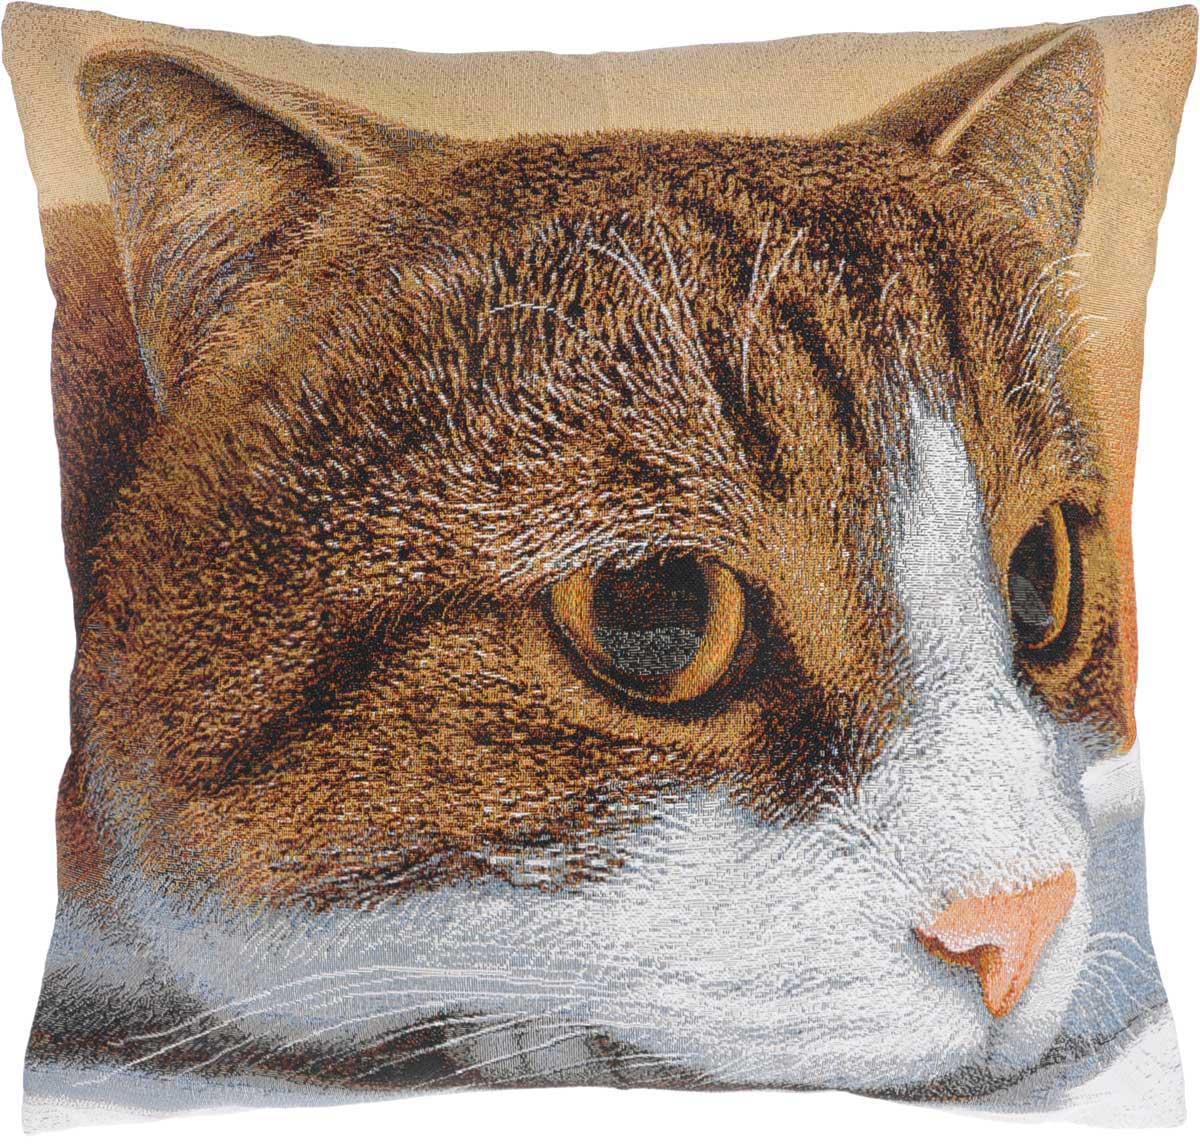 Подушка декоративная Рапира Весна, 45 х 45 см подушка декоративная рапира игривые котята в корзине 35 х 90 см